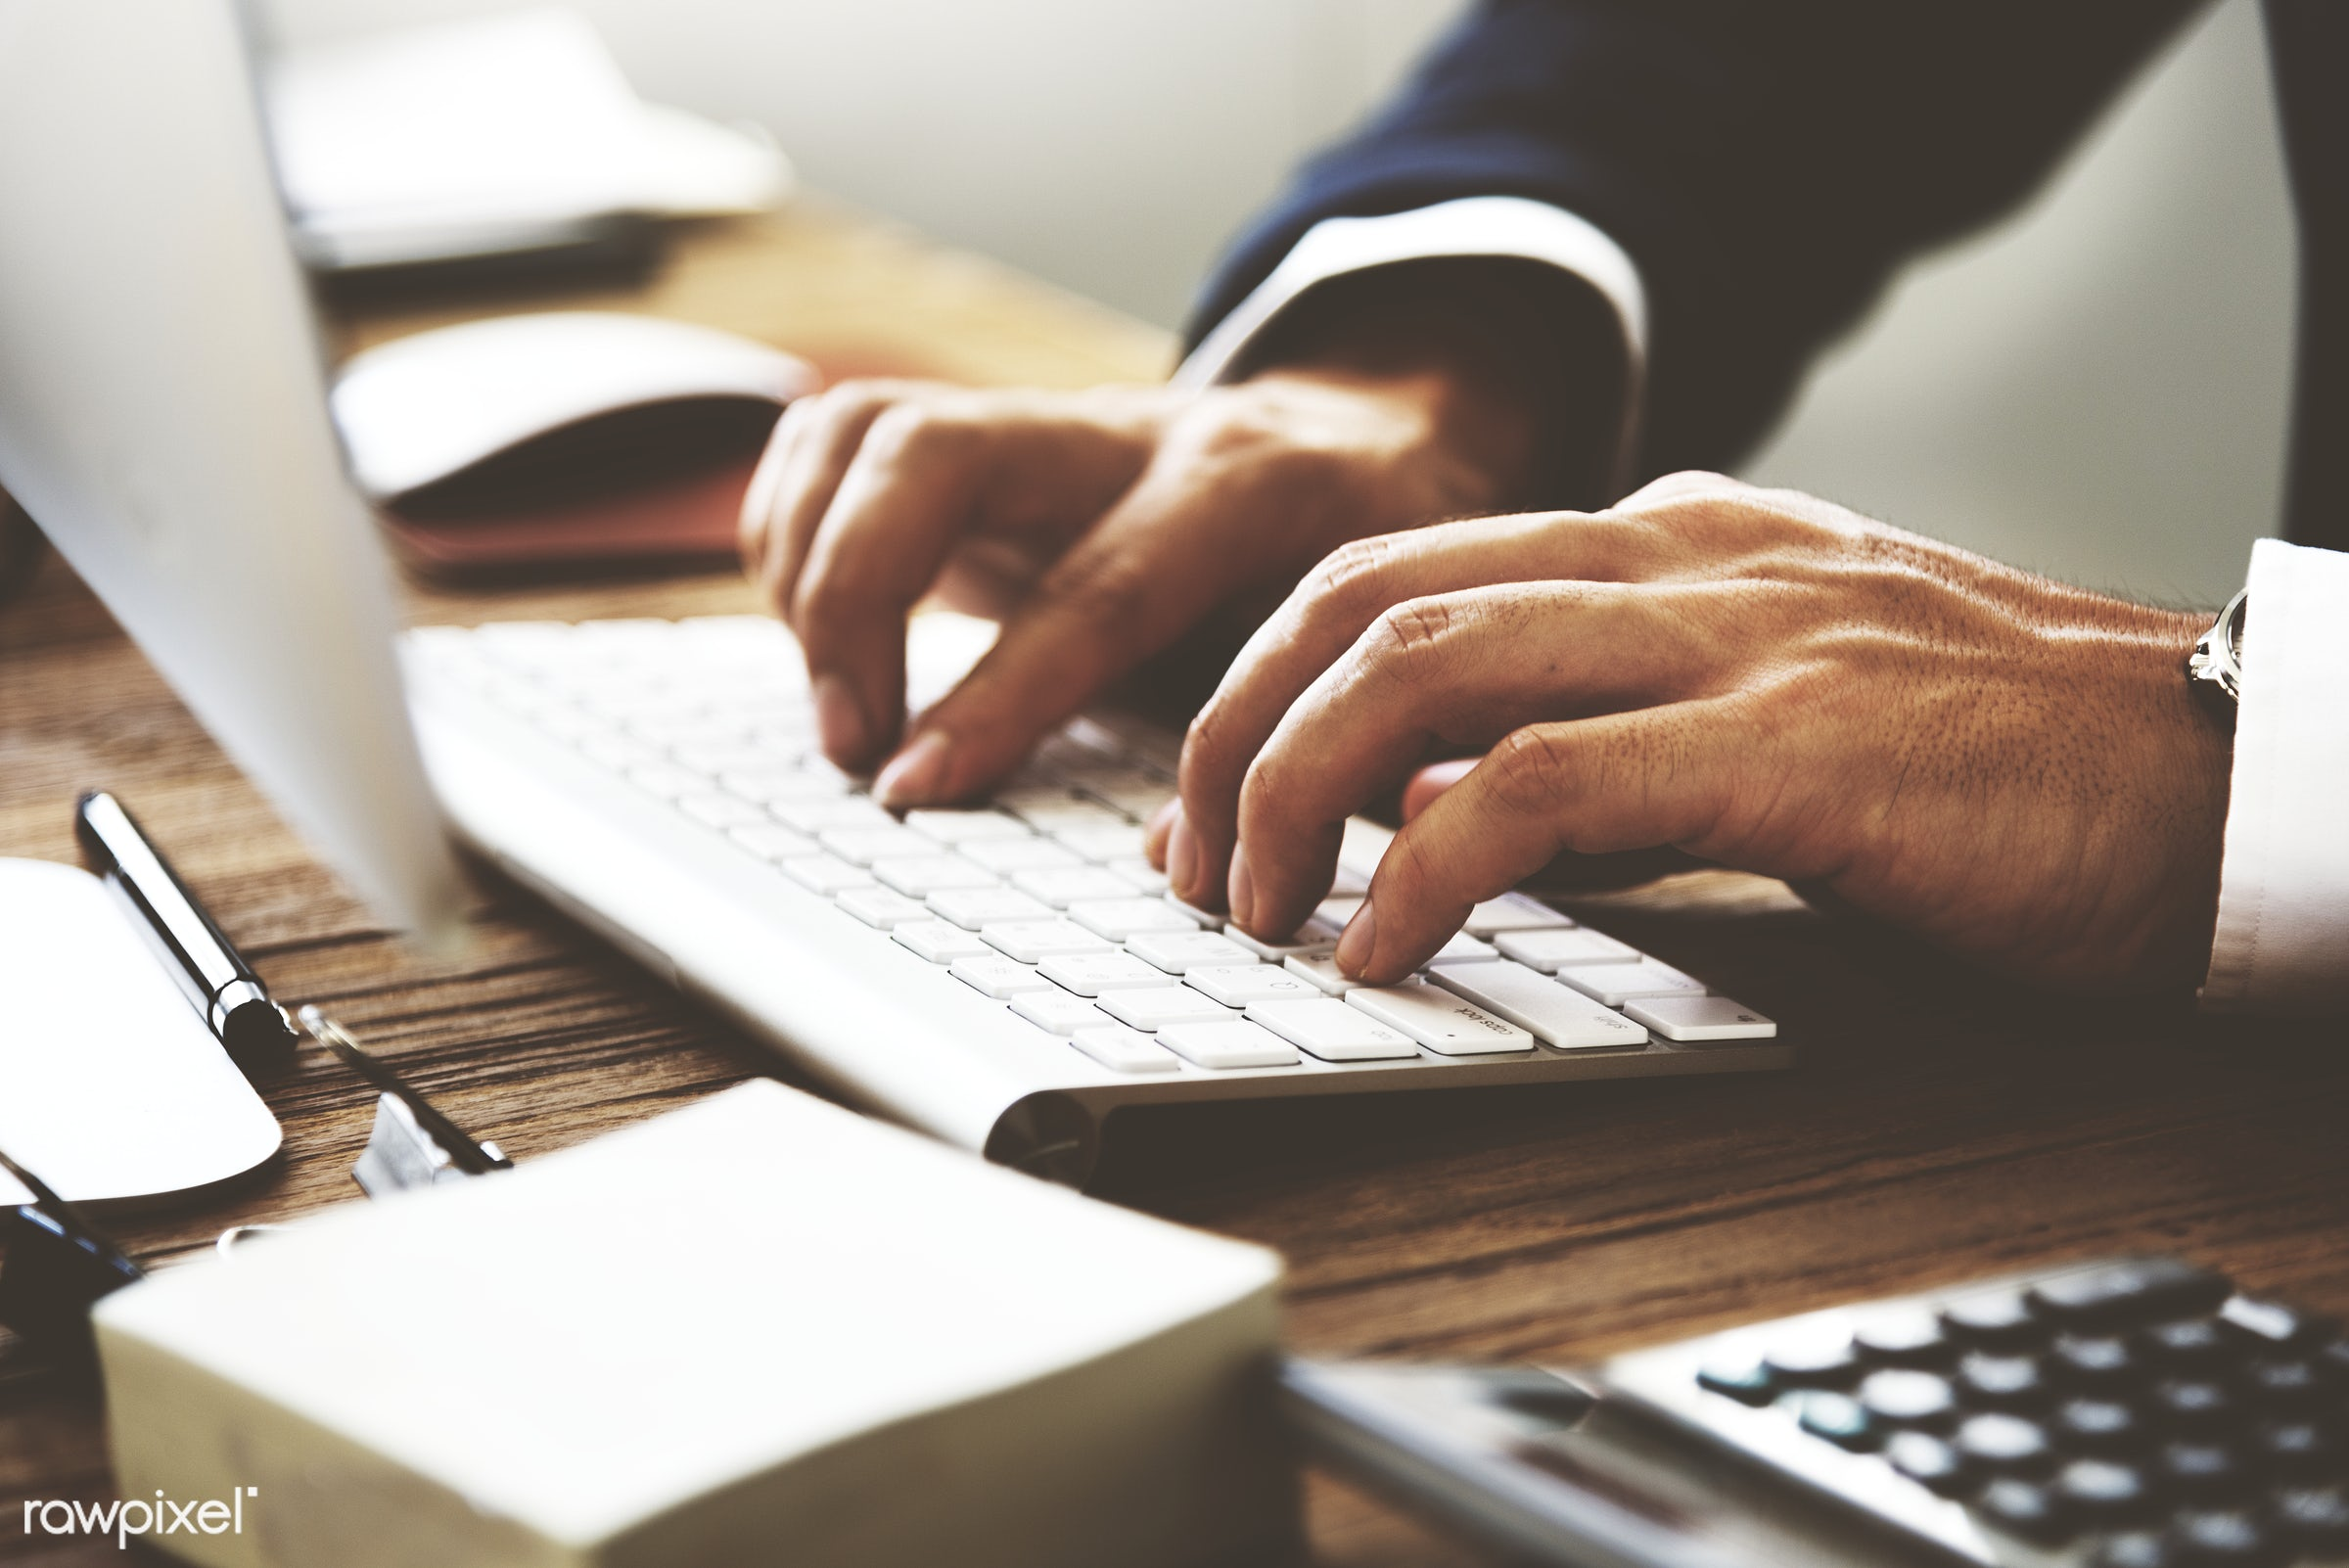 business, businessman, calculator, career, computer, corporate, desk, electronic, employer, fingers, hands, indoor, internet...